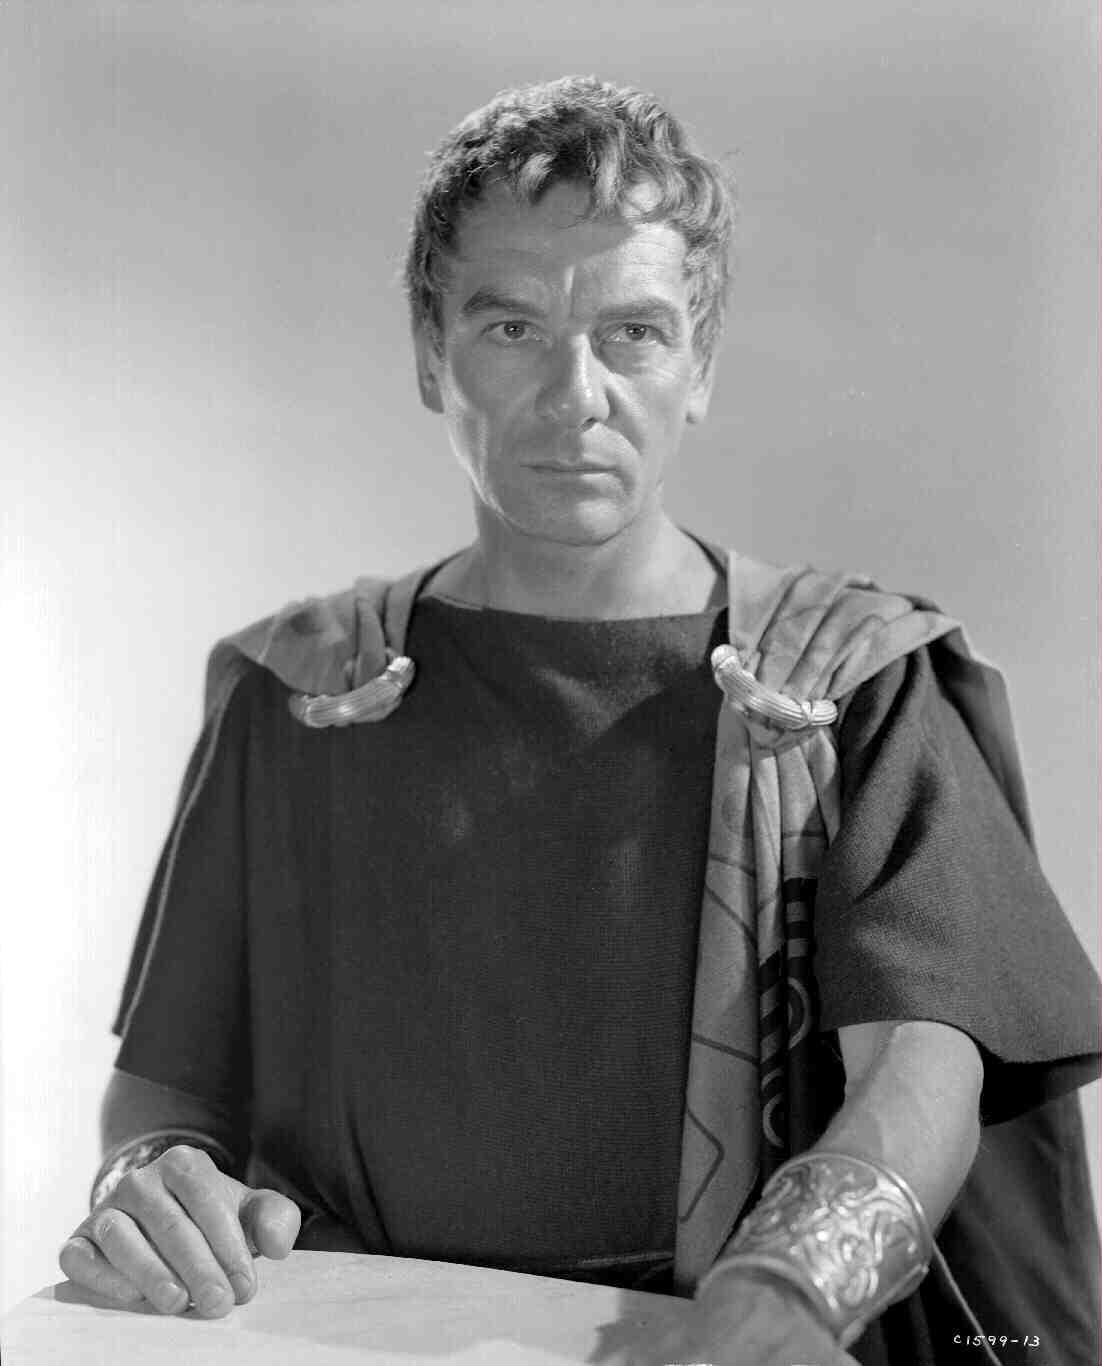 Eclectic Rhapsodics: Well, Brutus, Thou Art Noble